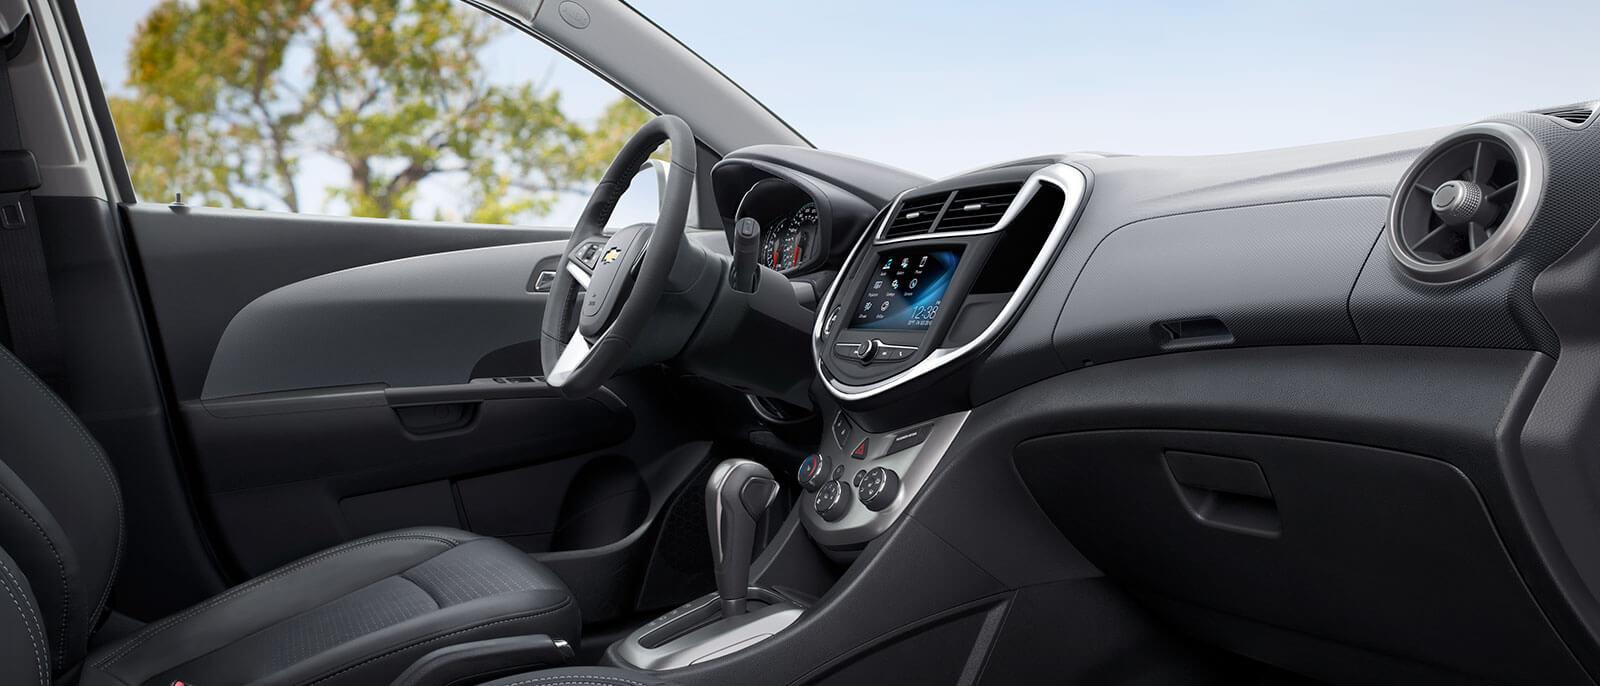 2017 Chevrolet Sonic interior dashboard